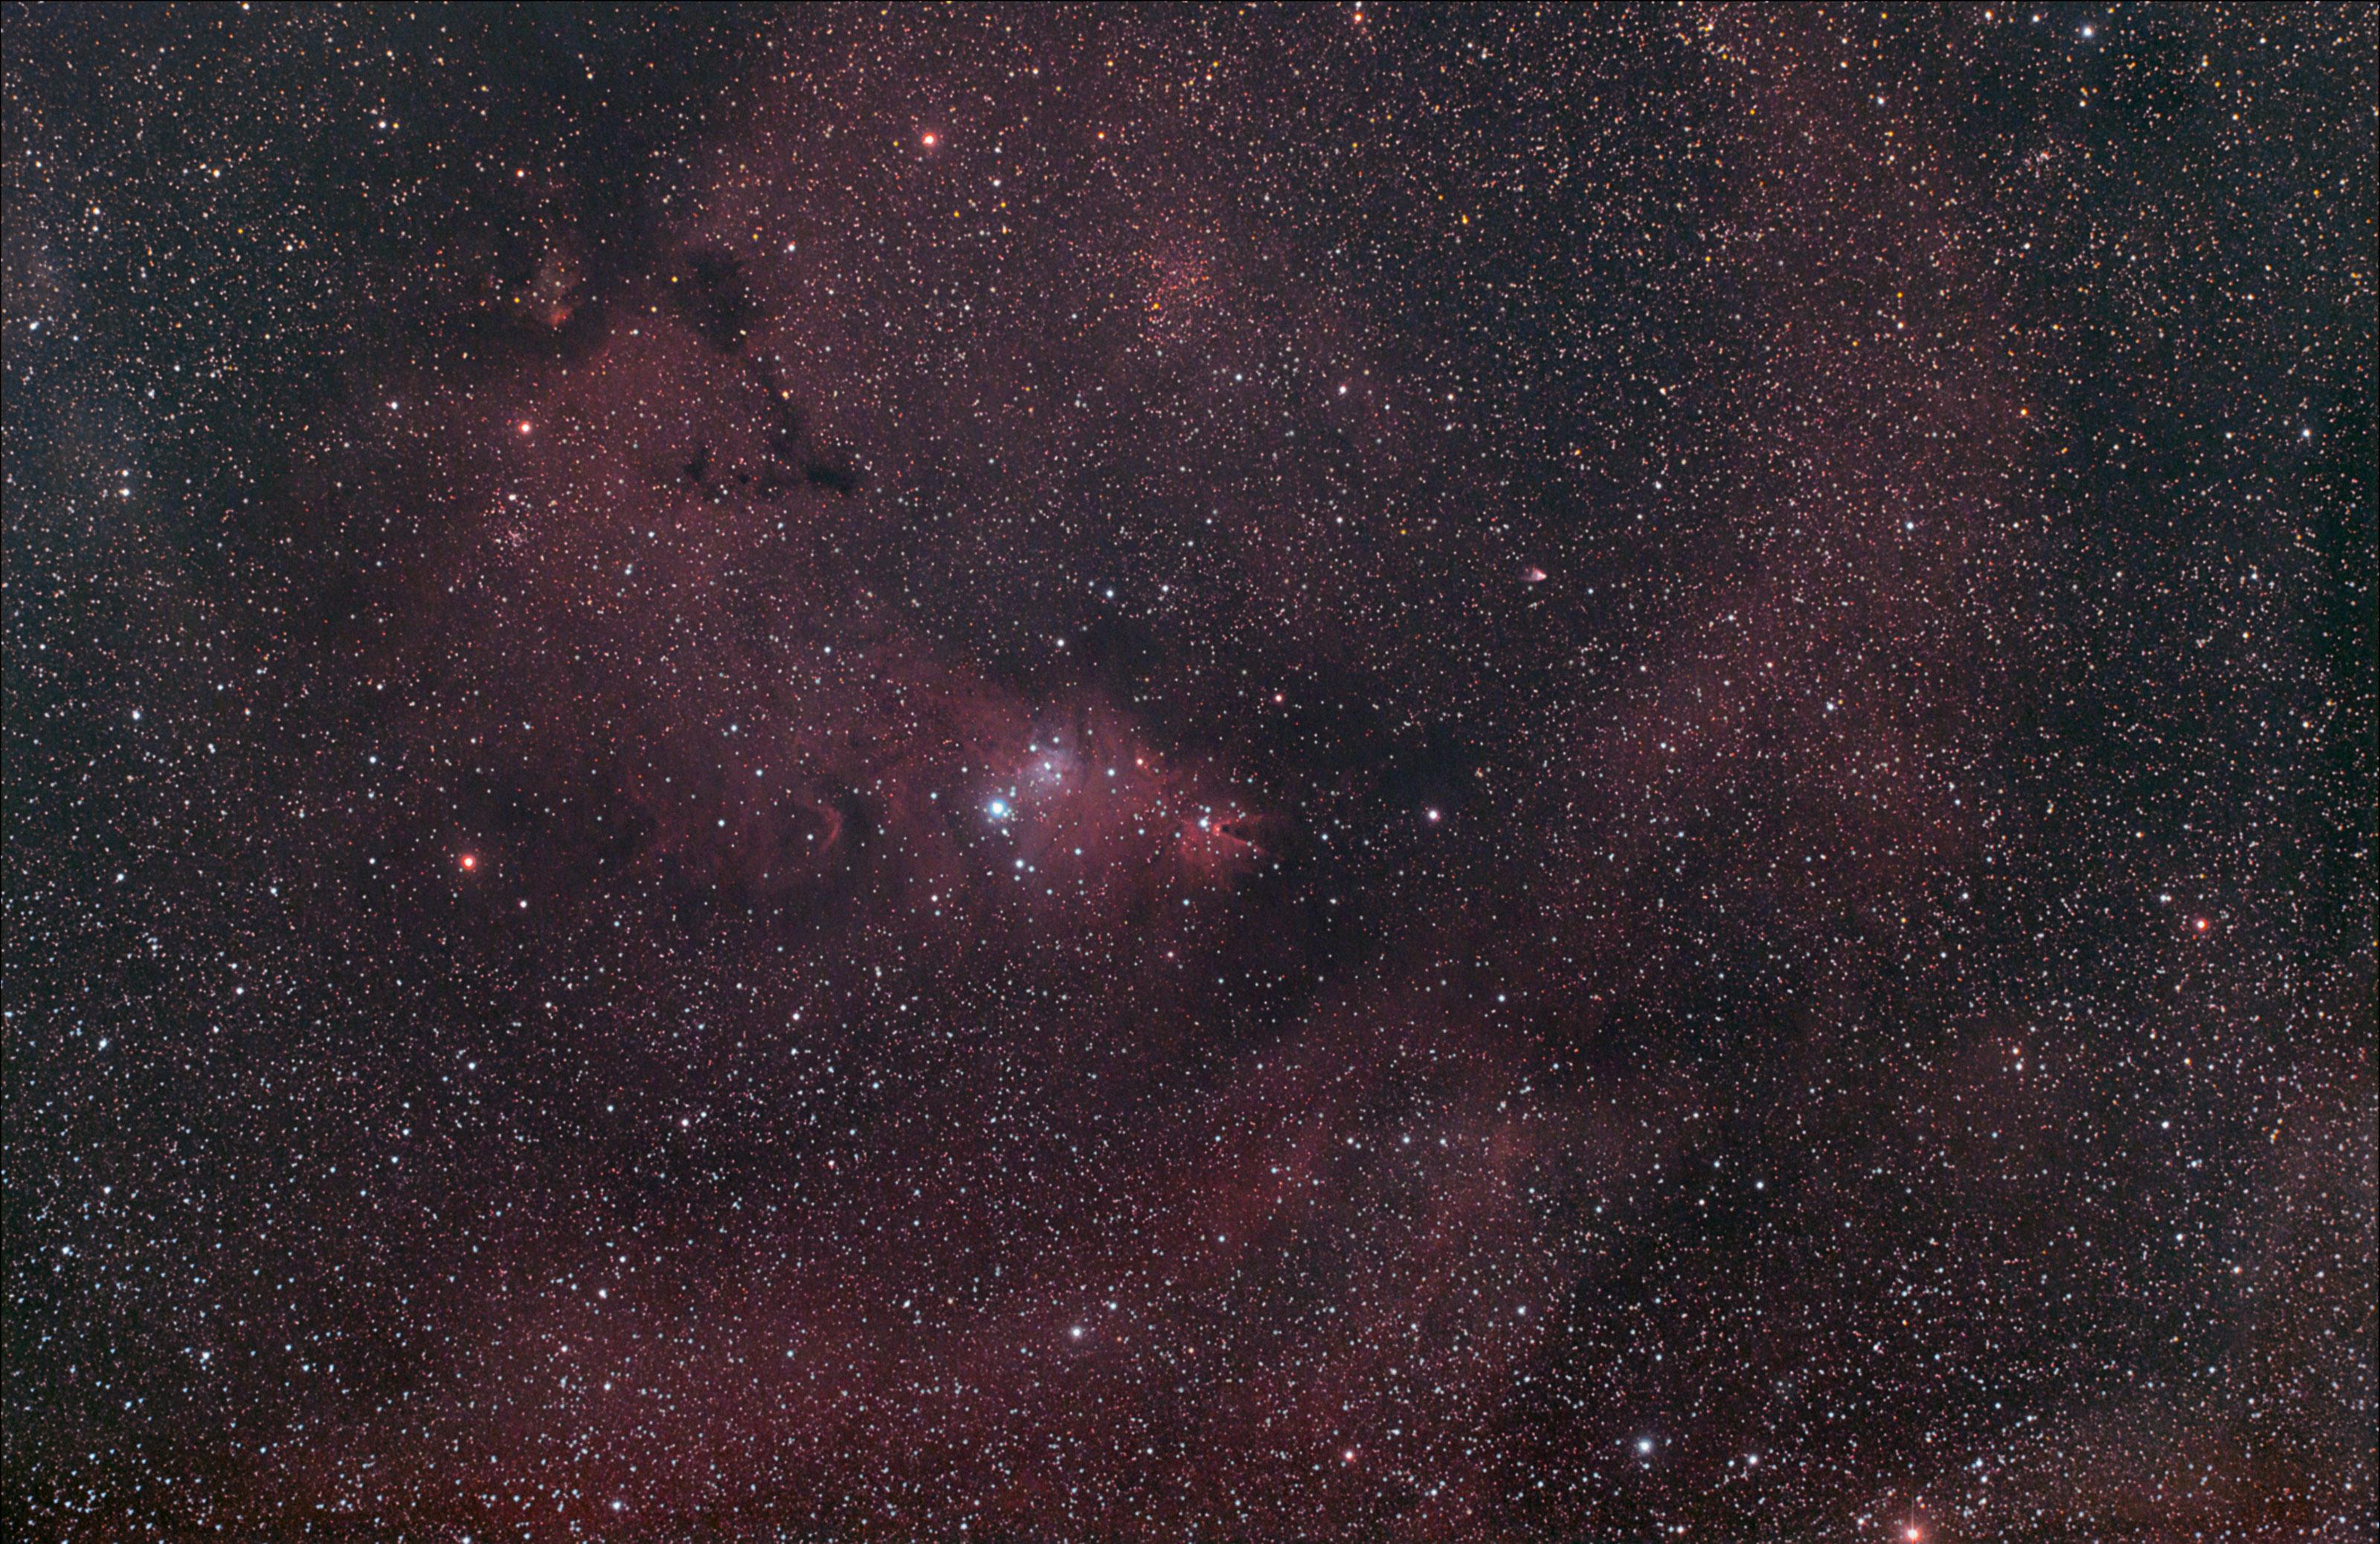 NGC2264_full_57x15min_fs60_350d_baader_janv2013_2Mo